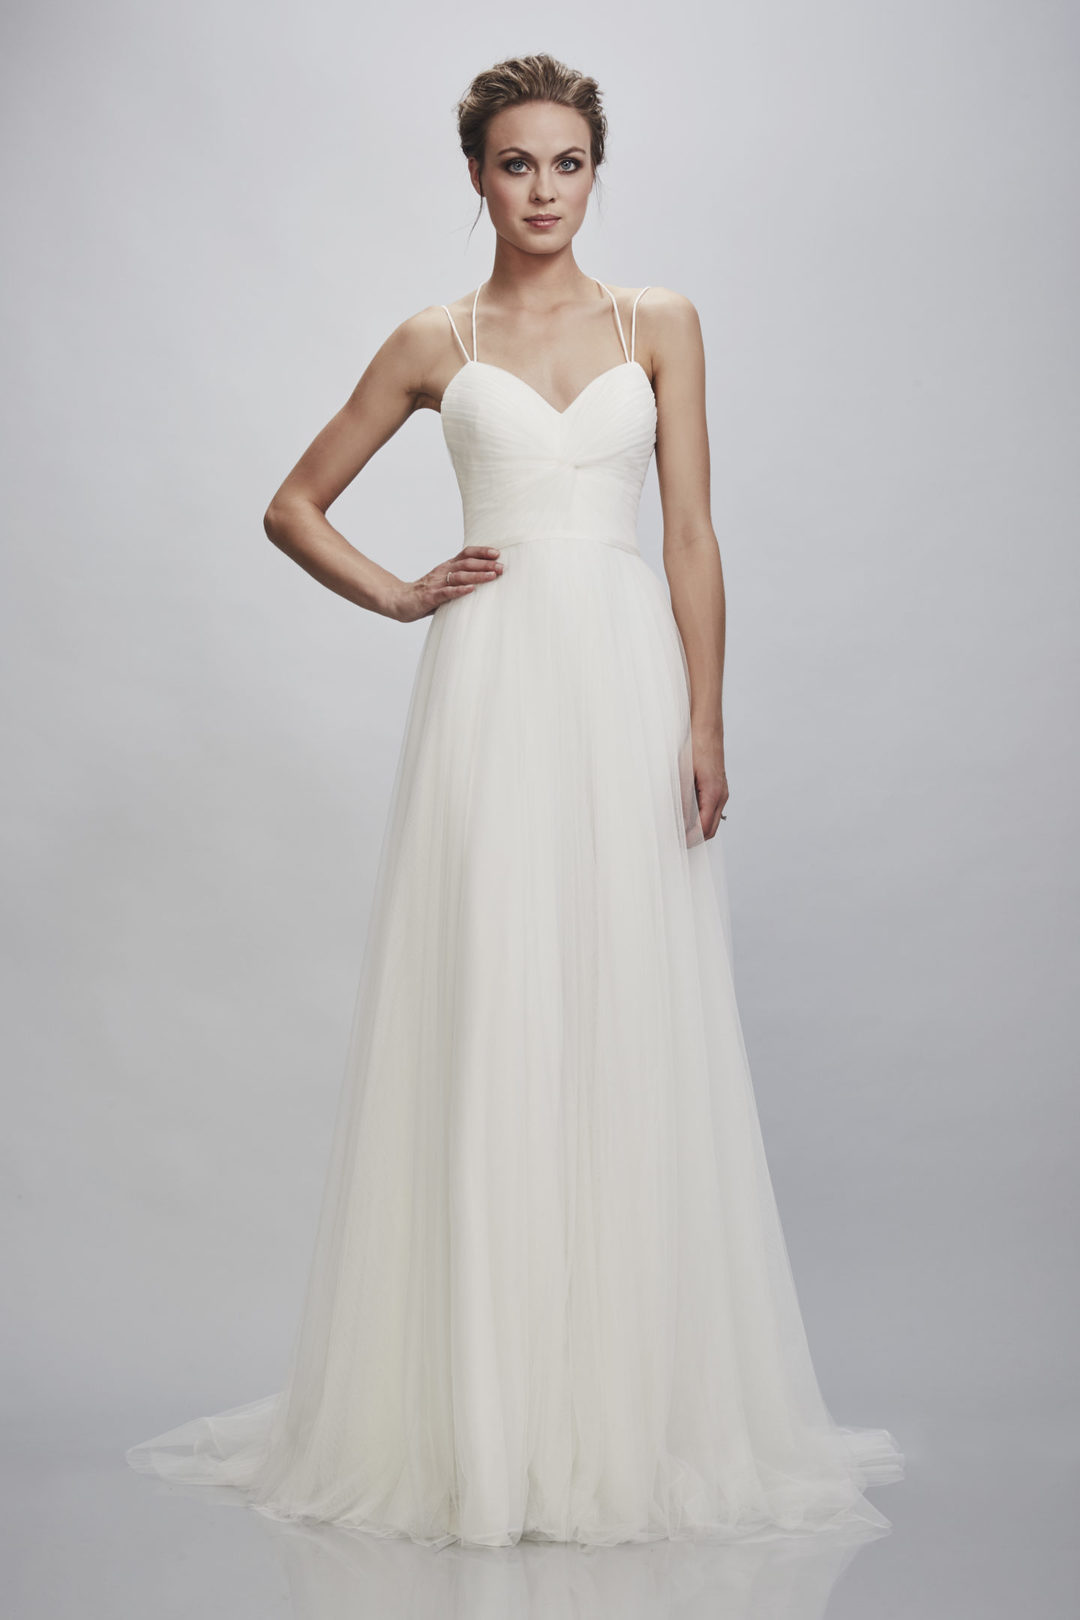 890510 sabrina  dress photo